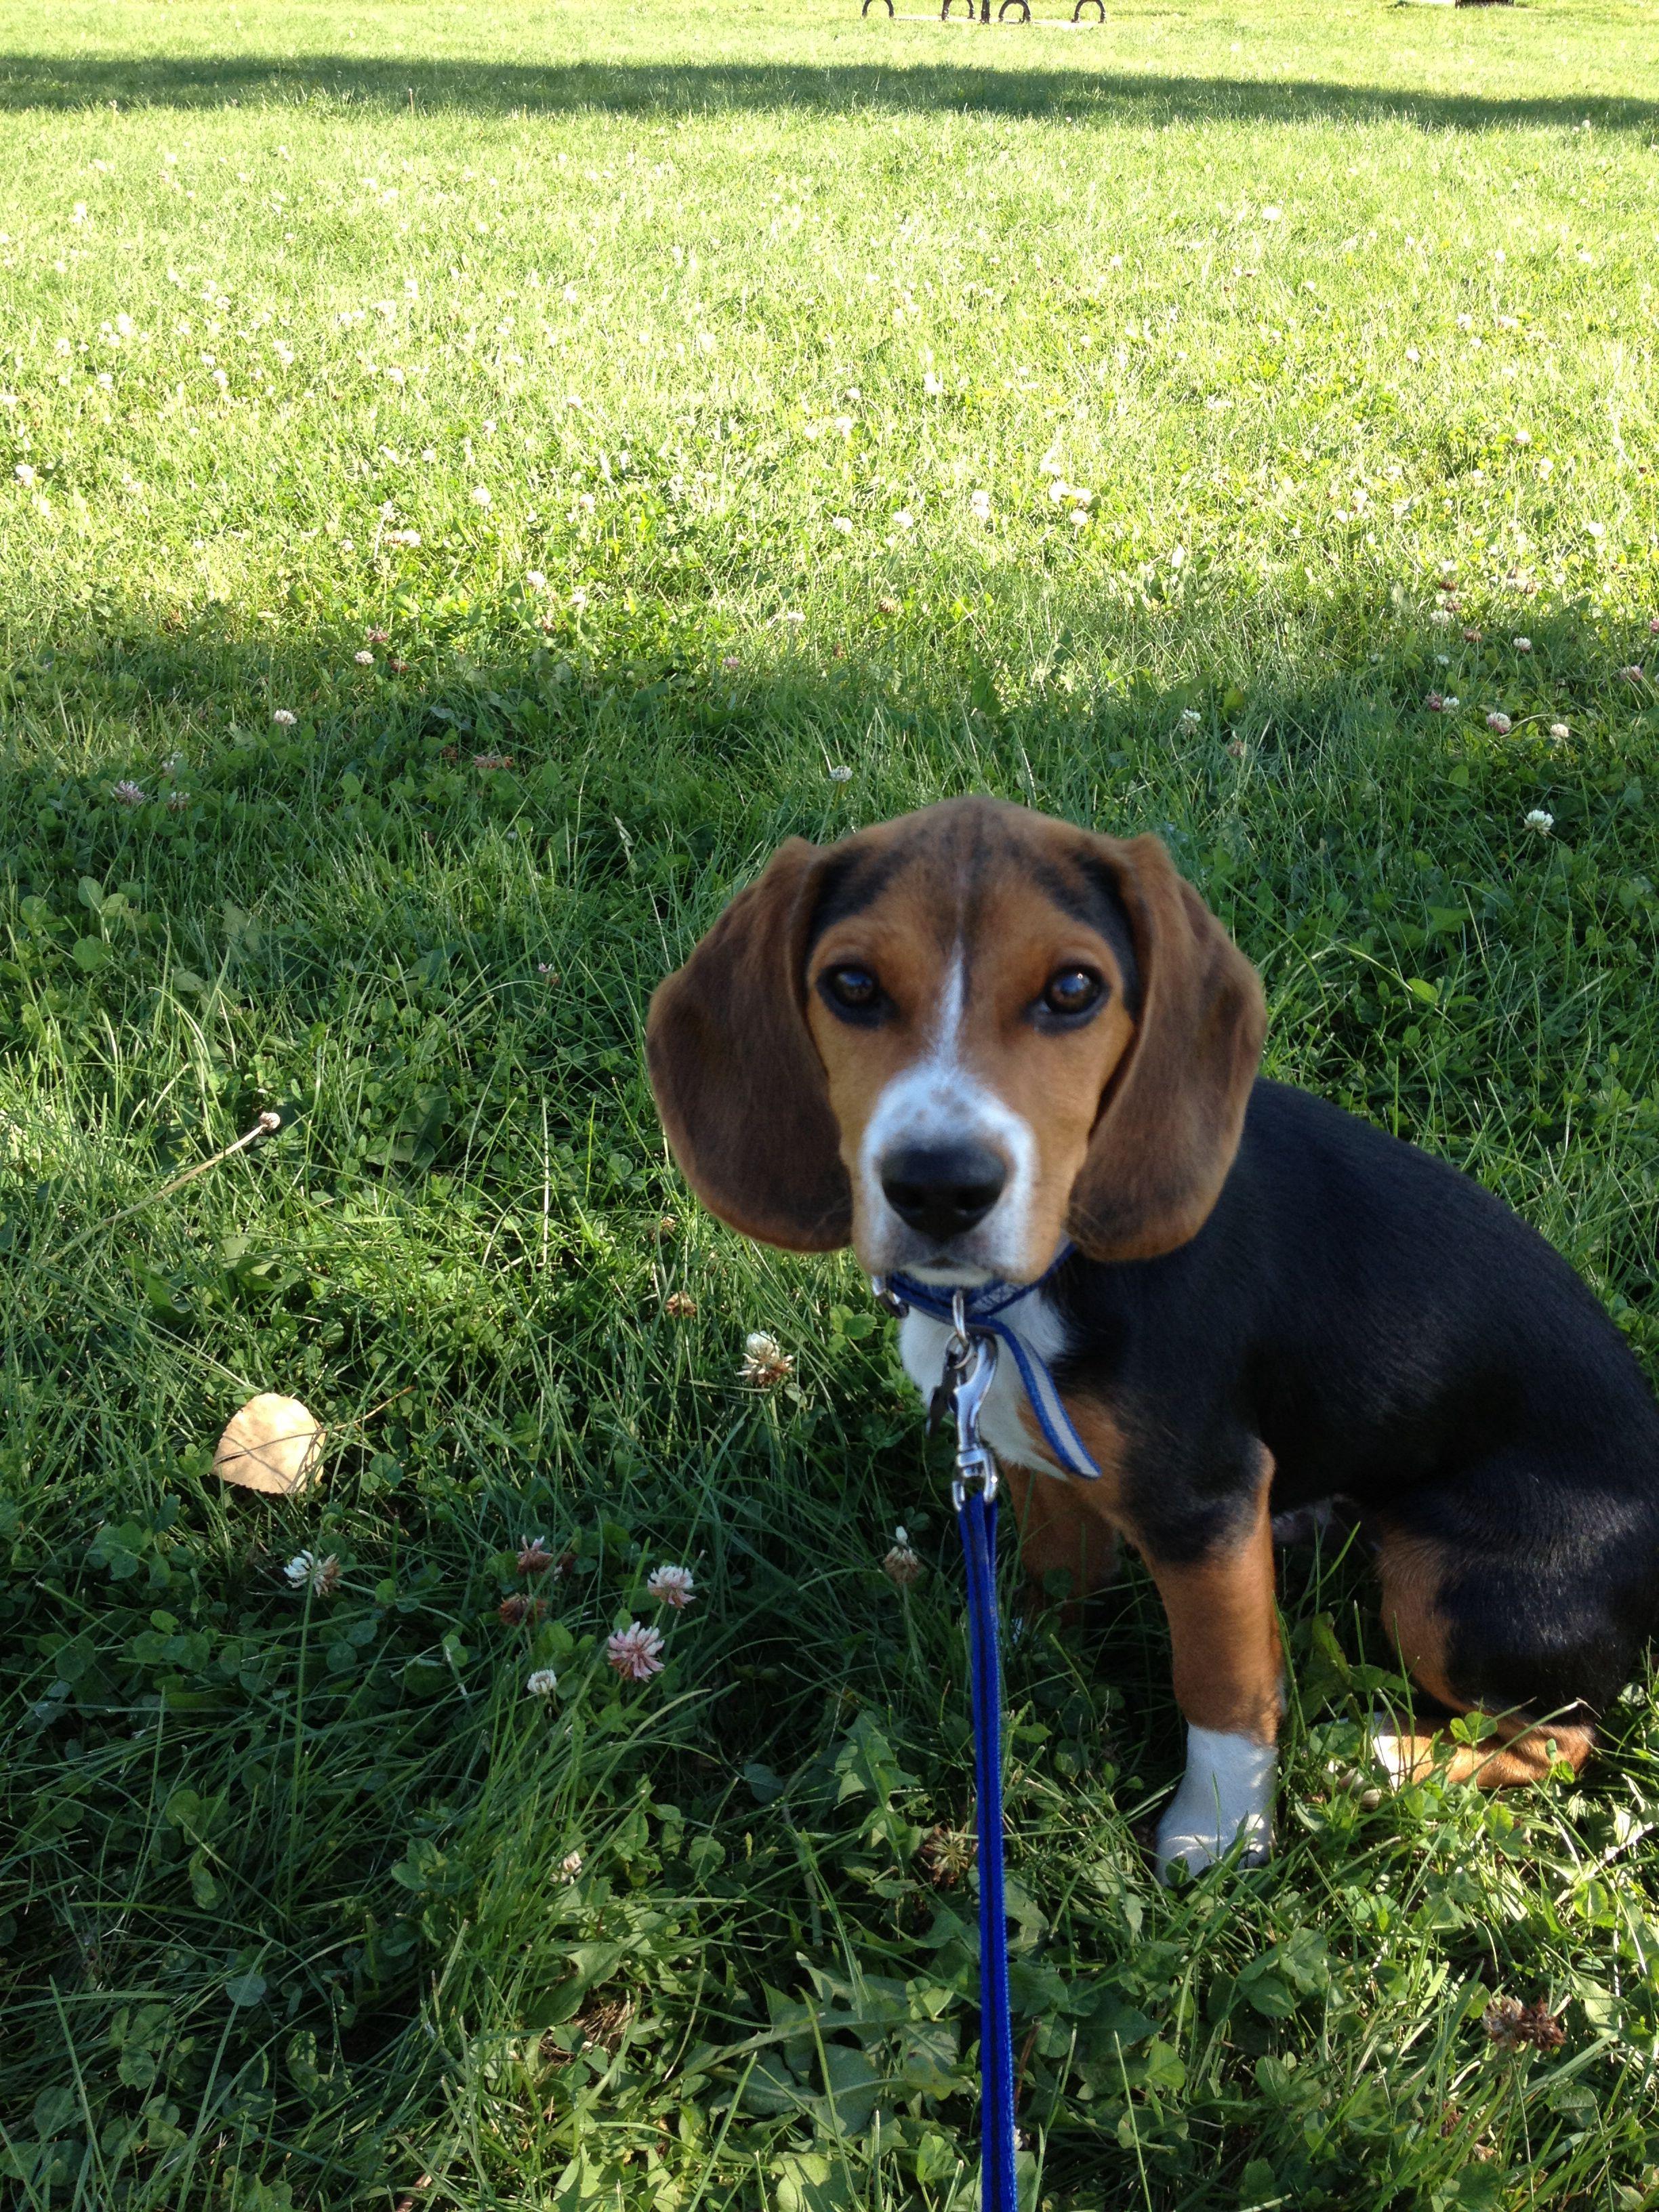 Adorable Beagle Puppy Beagle Puppy Puppies Animals